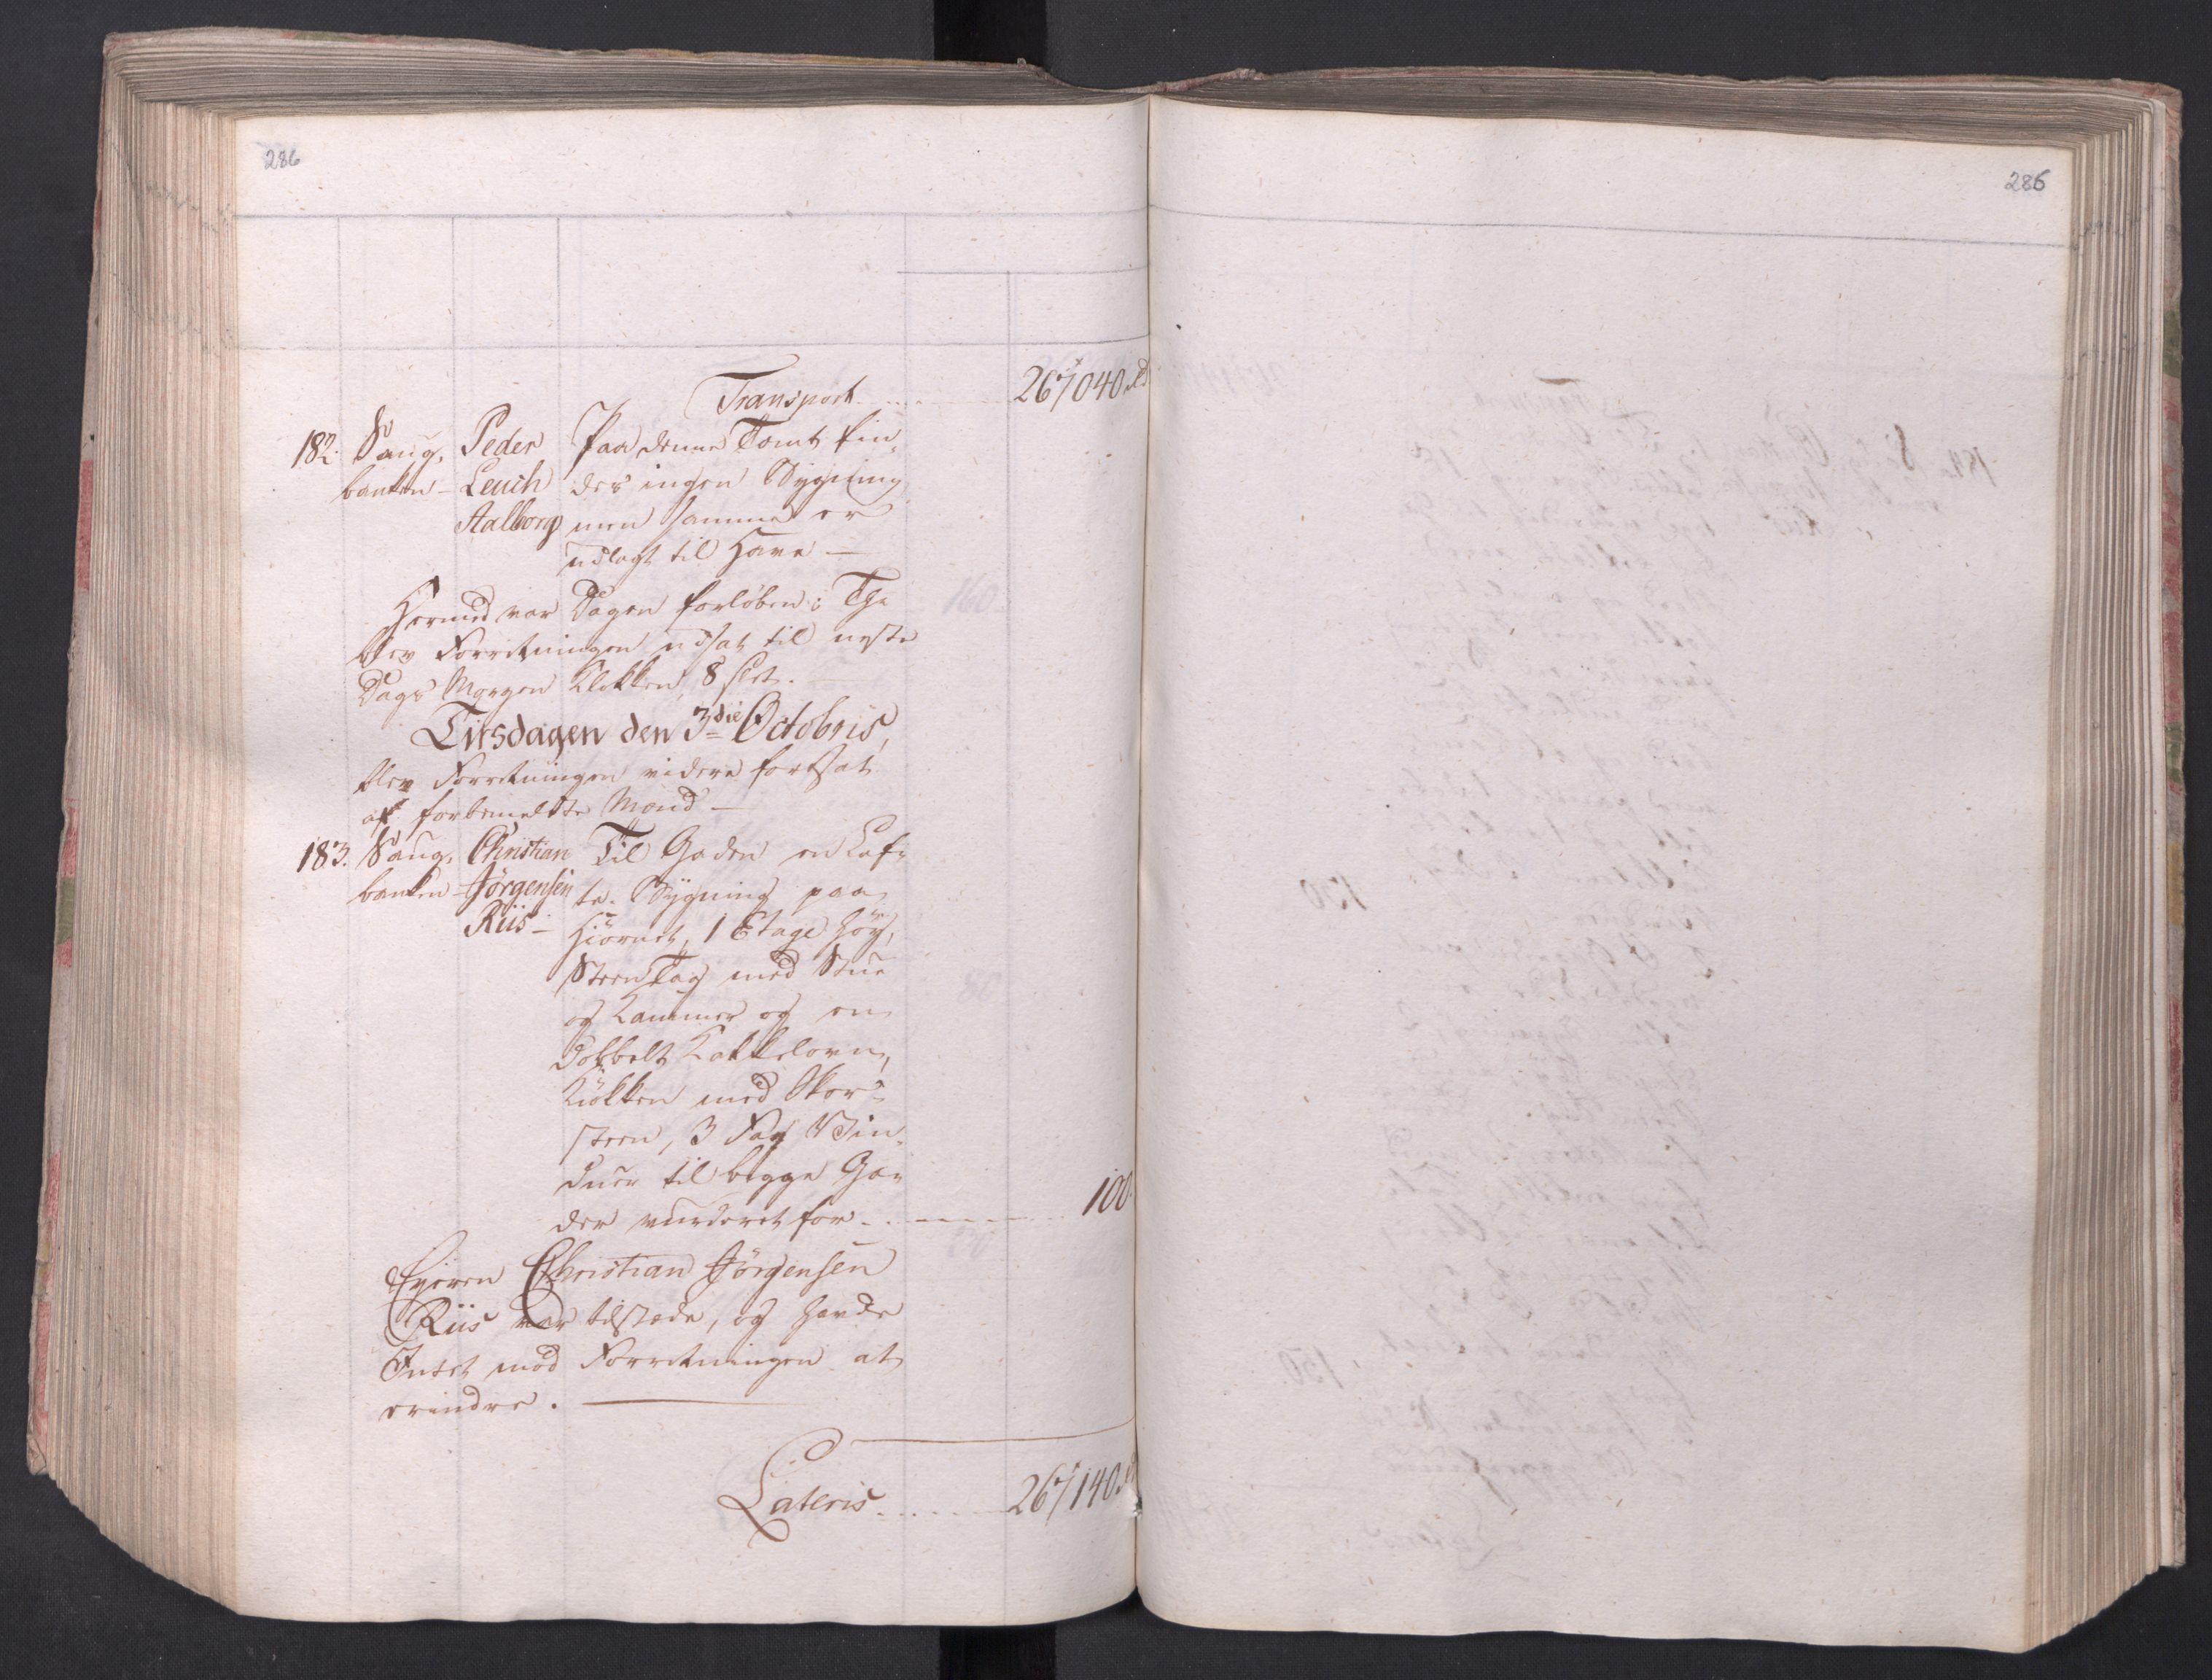 SAO, Kristiania stiftamt, I/Ia/L0015: Branntakster, 1797, s. 286